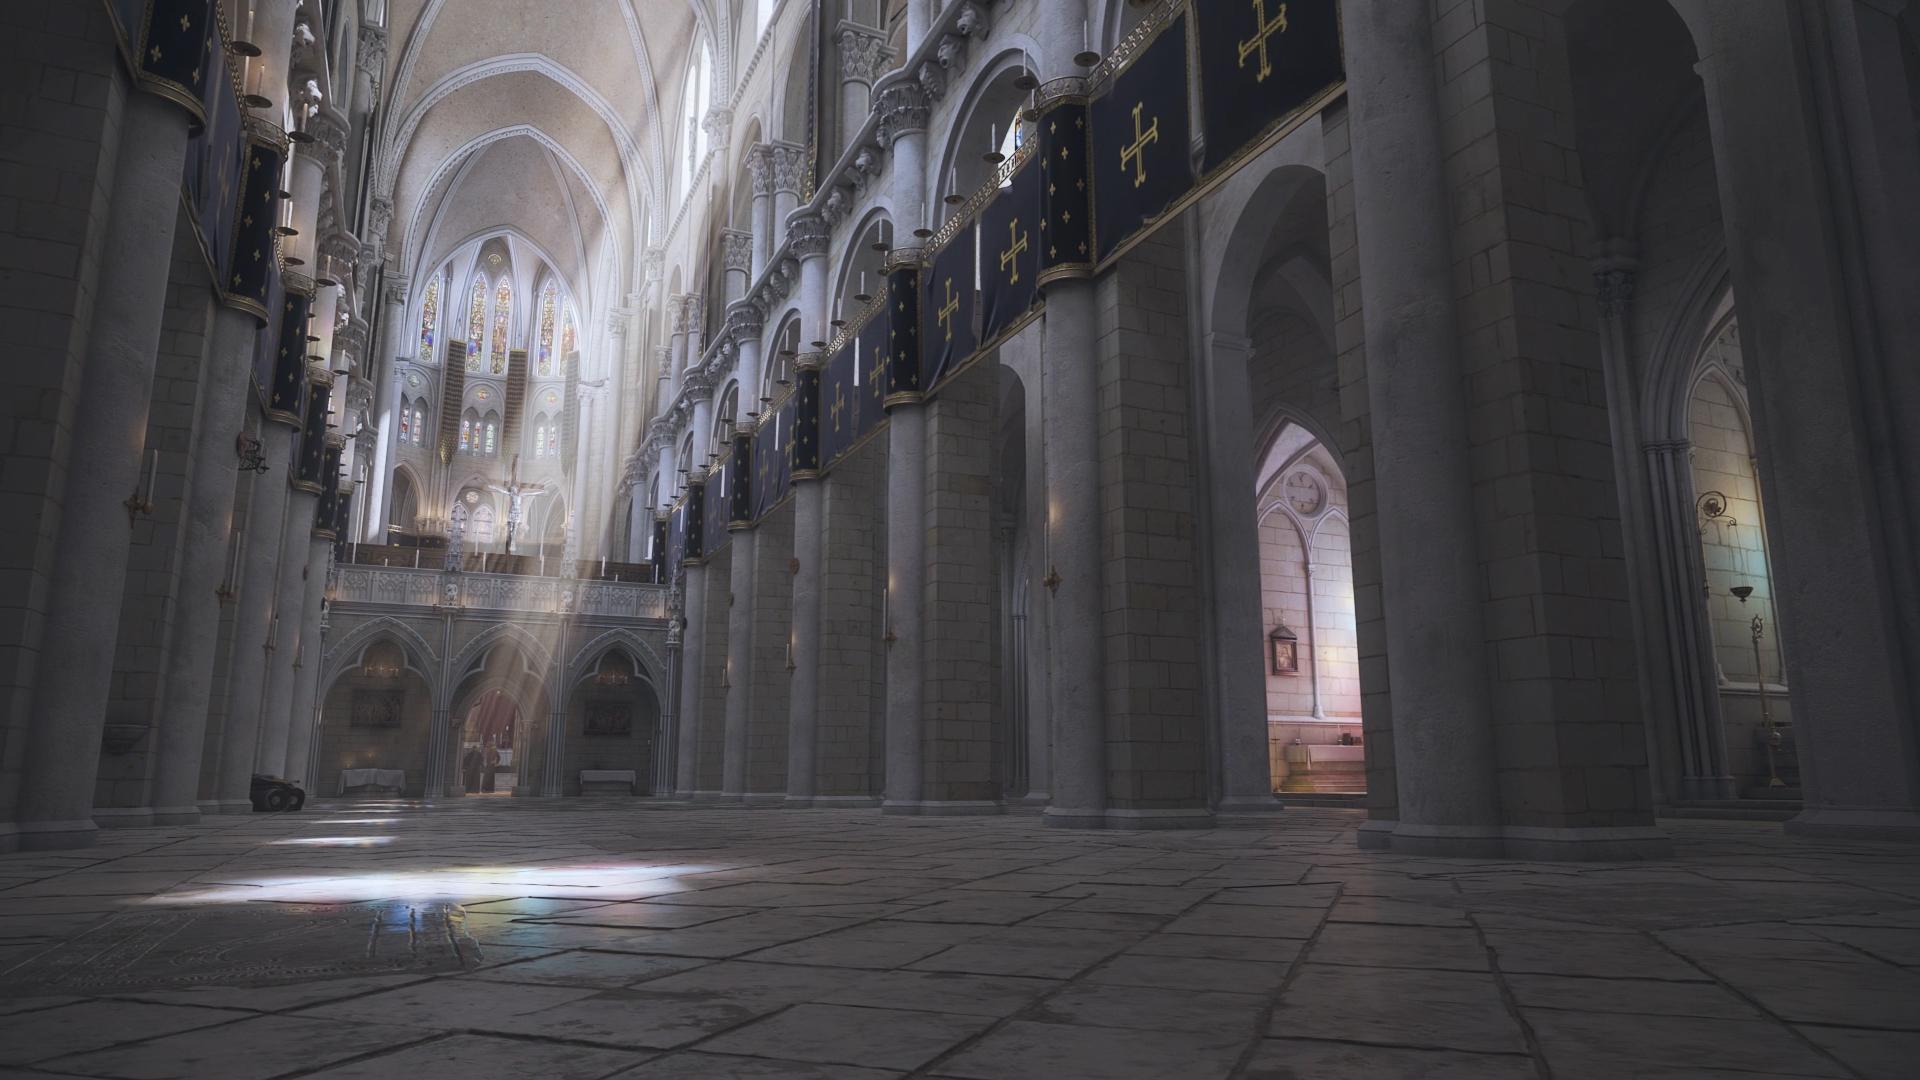 GALERIE-Dripmoon-Studio 3D-Tours-Reconstitution-Patrimoine-REVIS MARTIN (44) copie